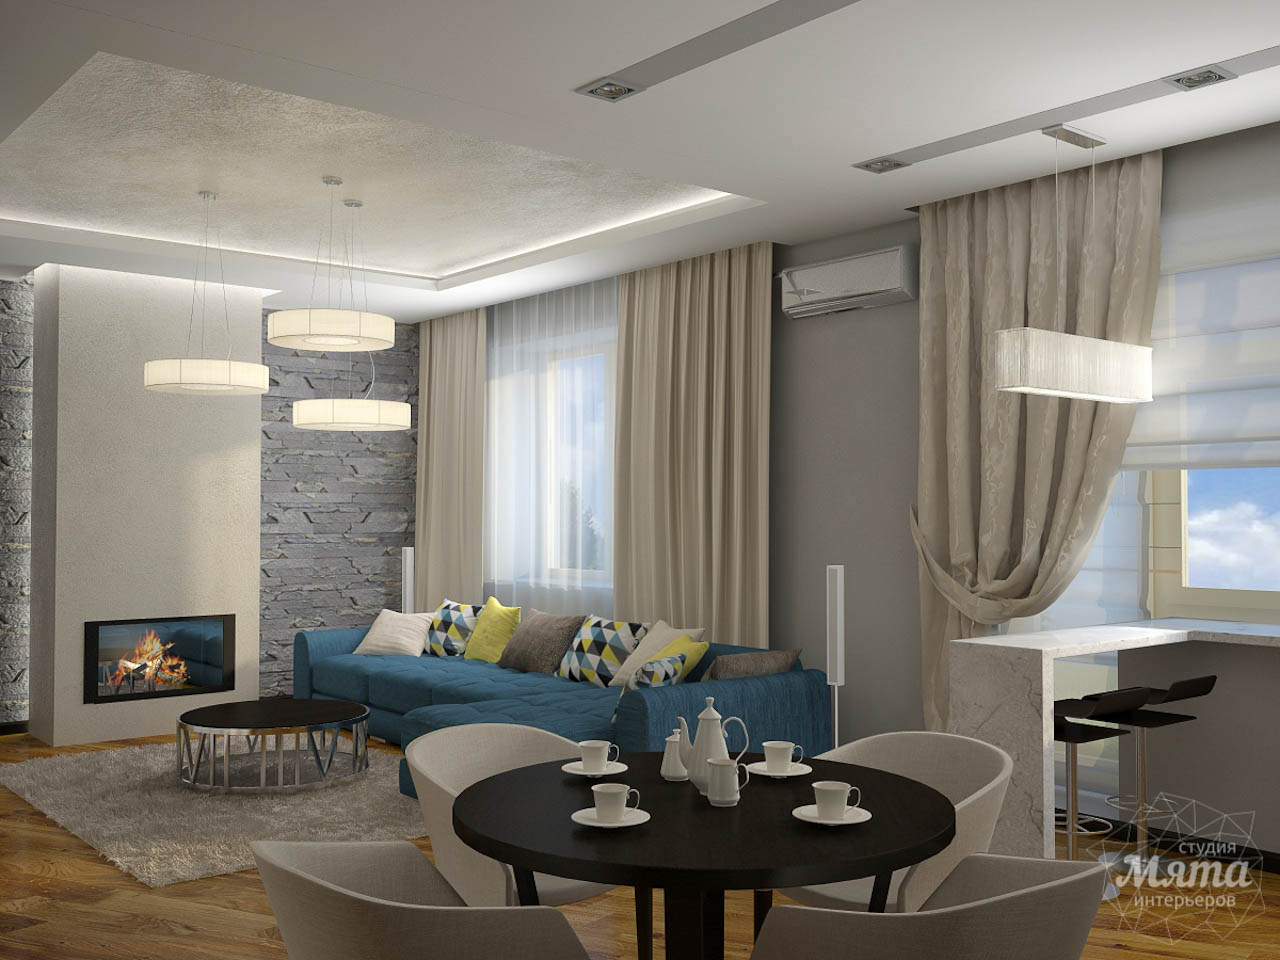 Дизайн проект интерьера коттеджа  в стиле минимализм по ул. Барвинка 15 img2130126172